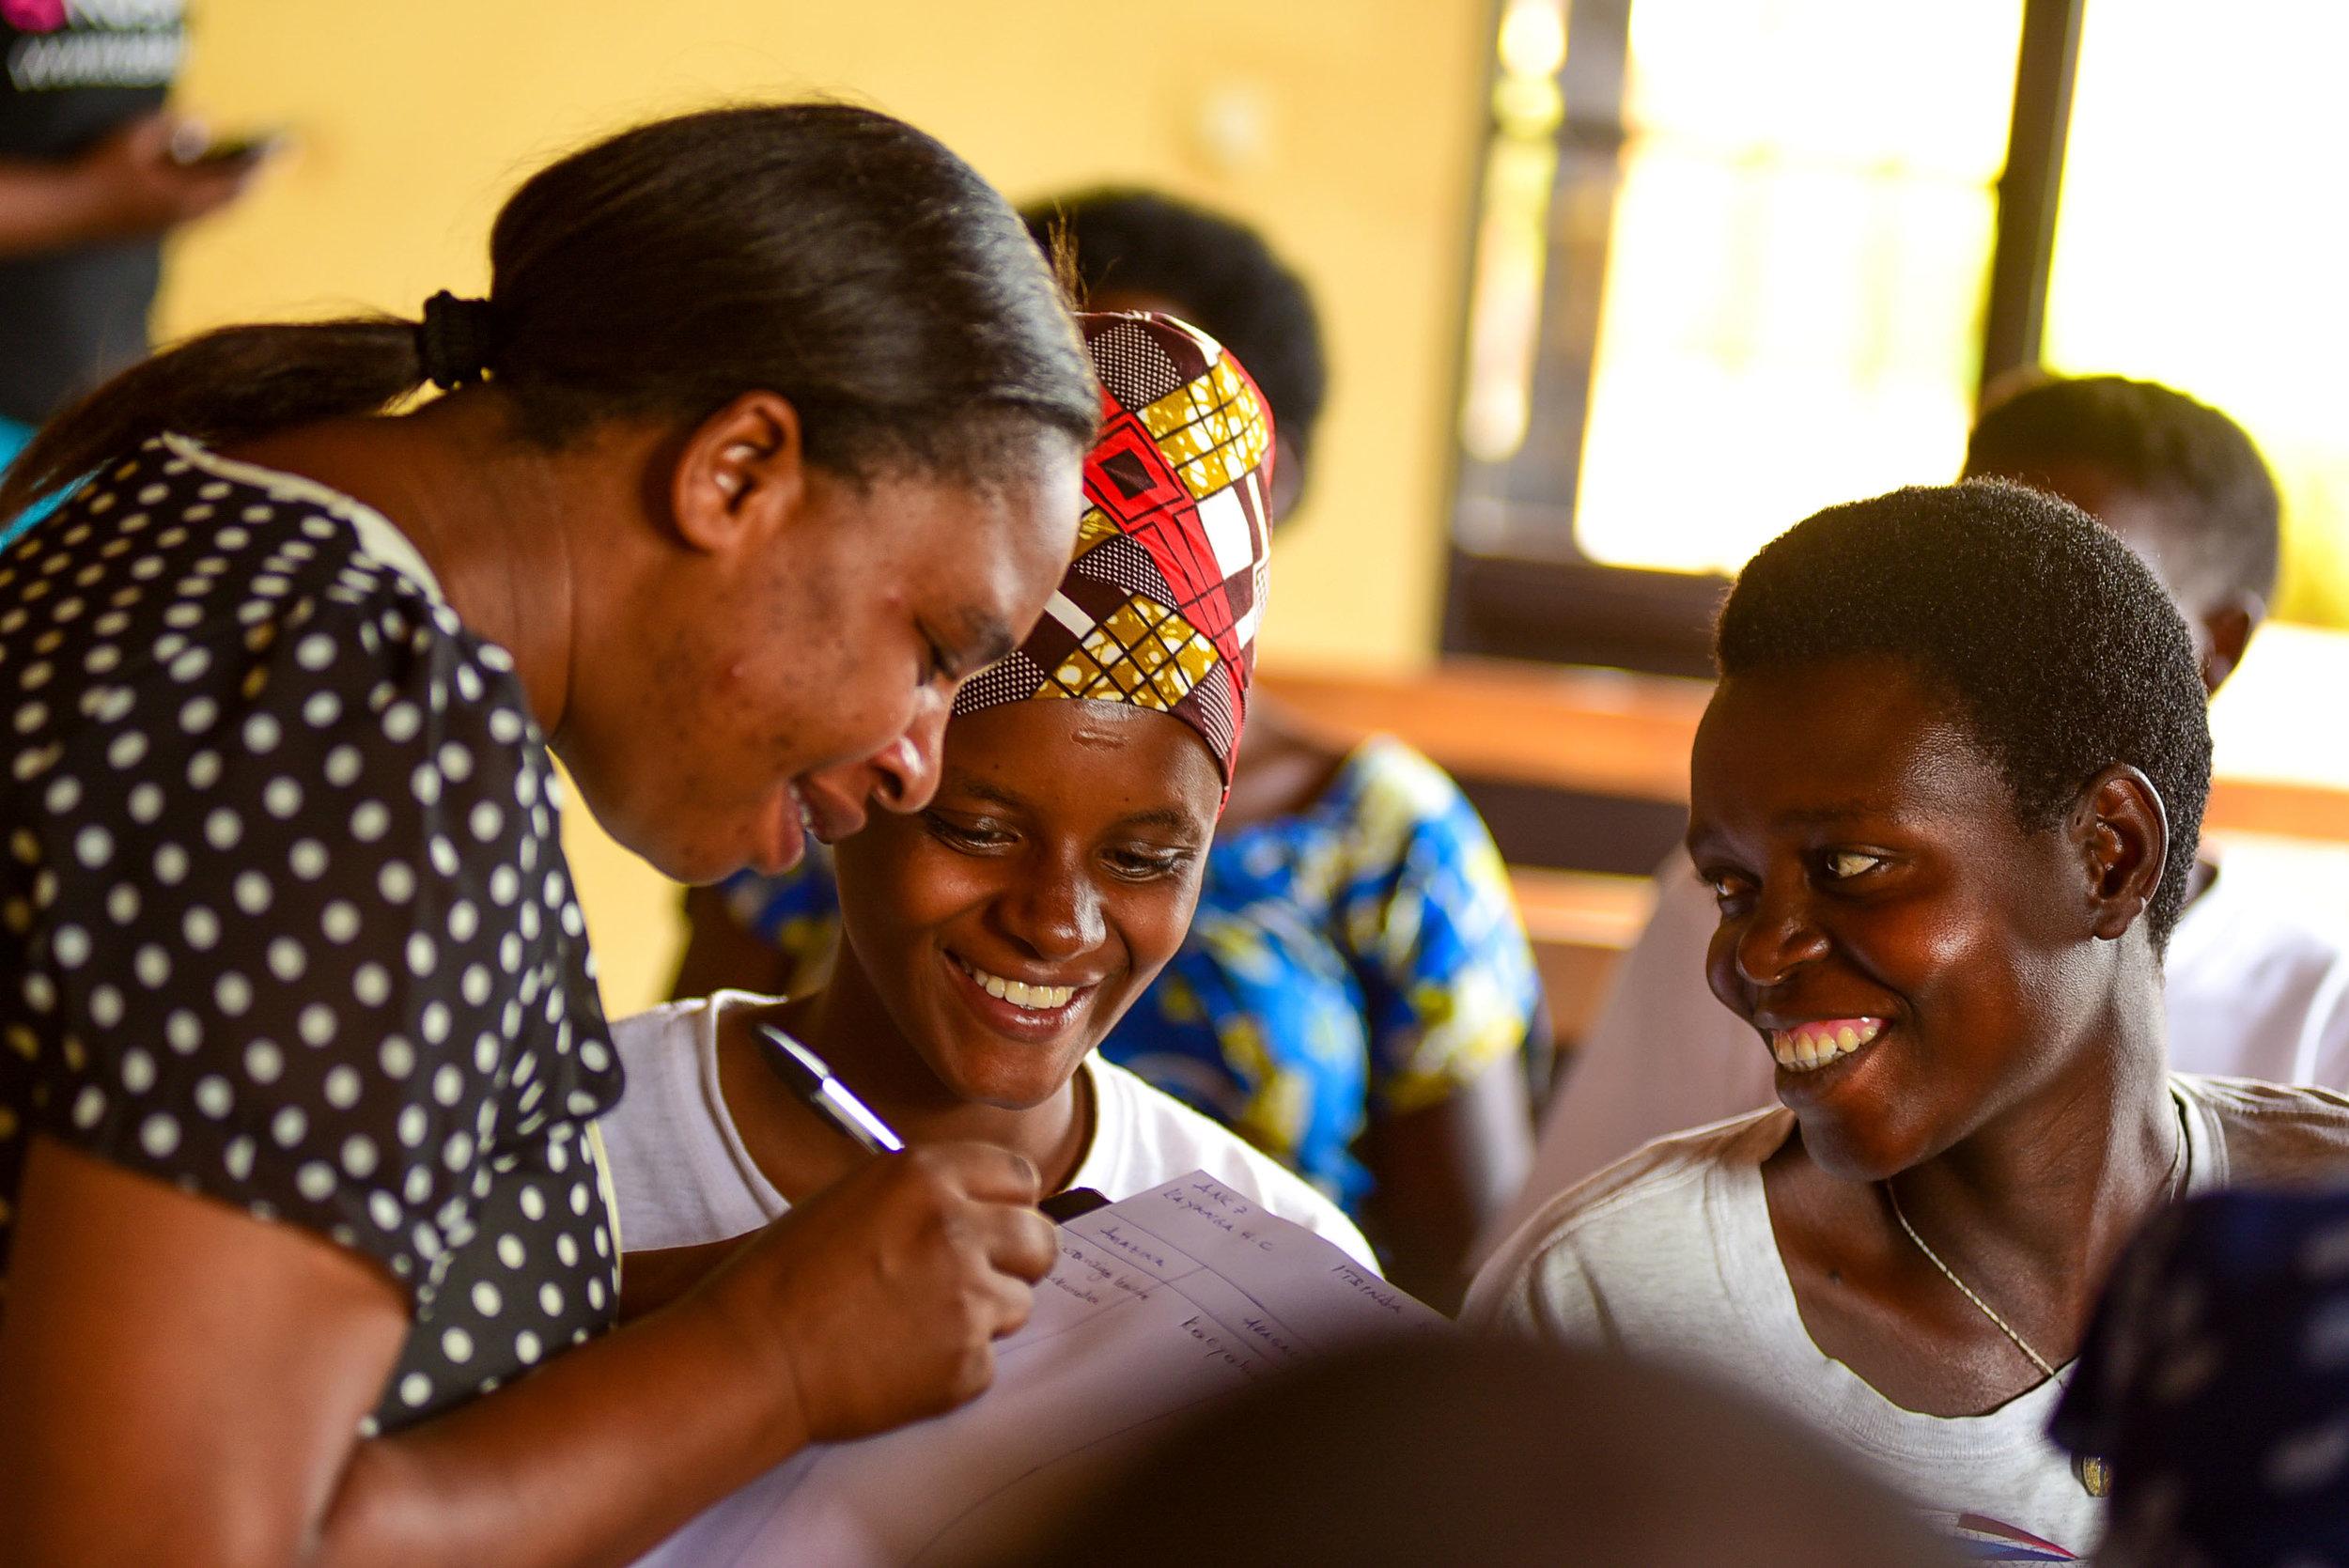 Gasabo District Field Educator Esperance Mukeshimana enrolls pregnant women into GHI's Antenatal Care Program on January 17, 2018.